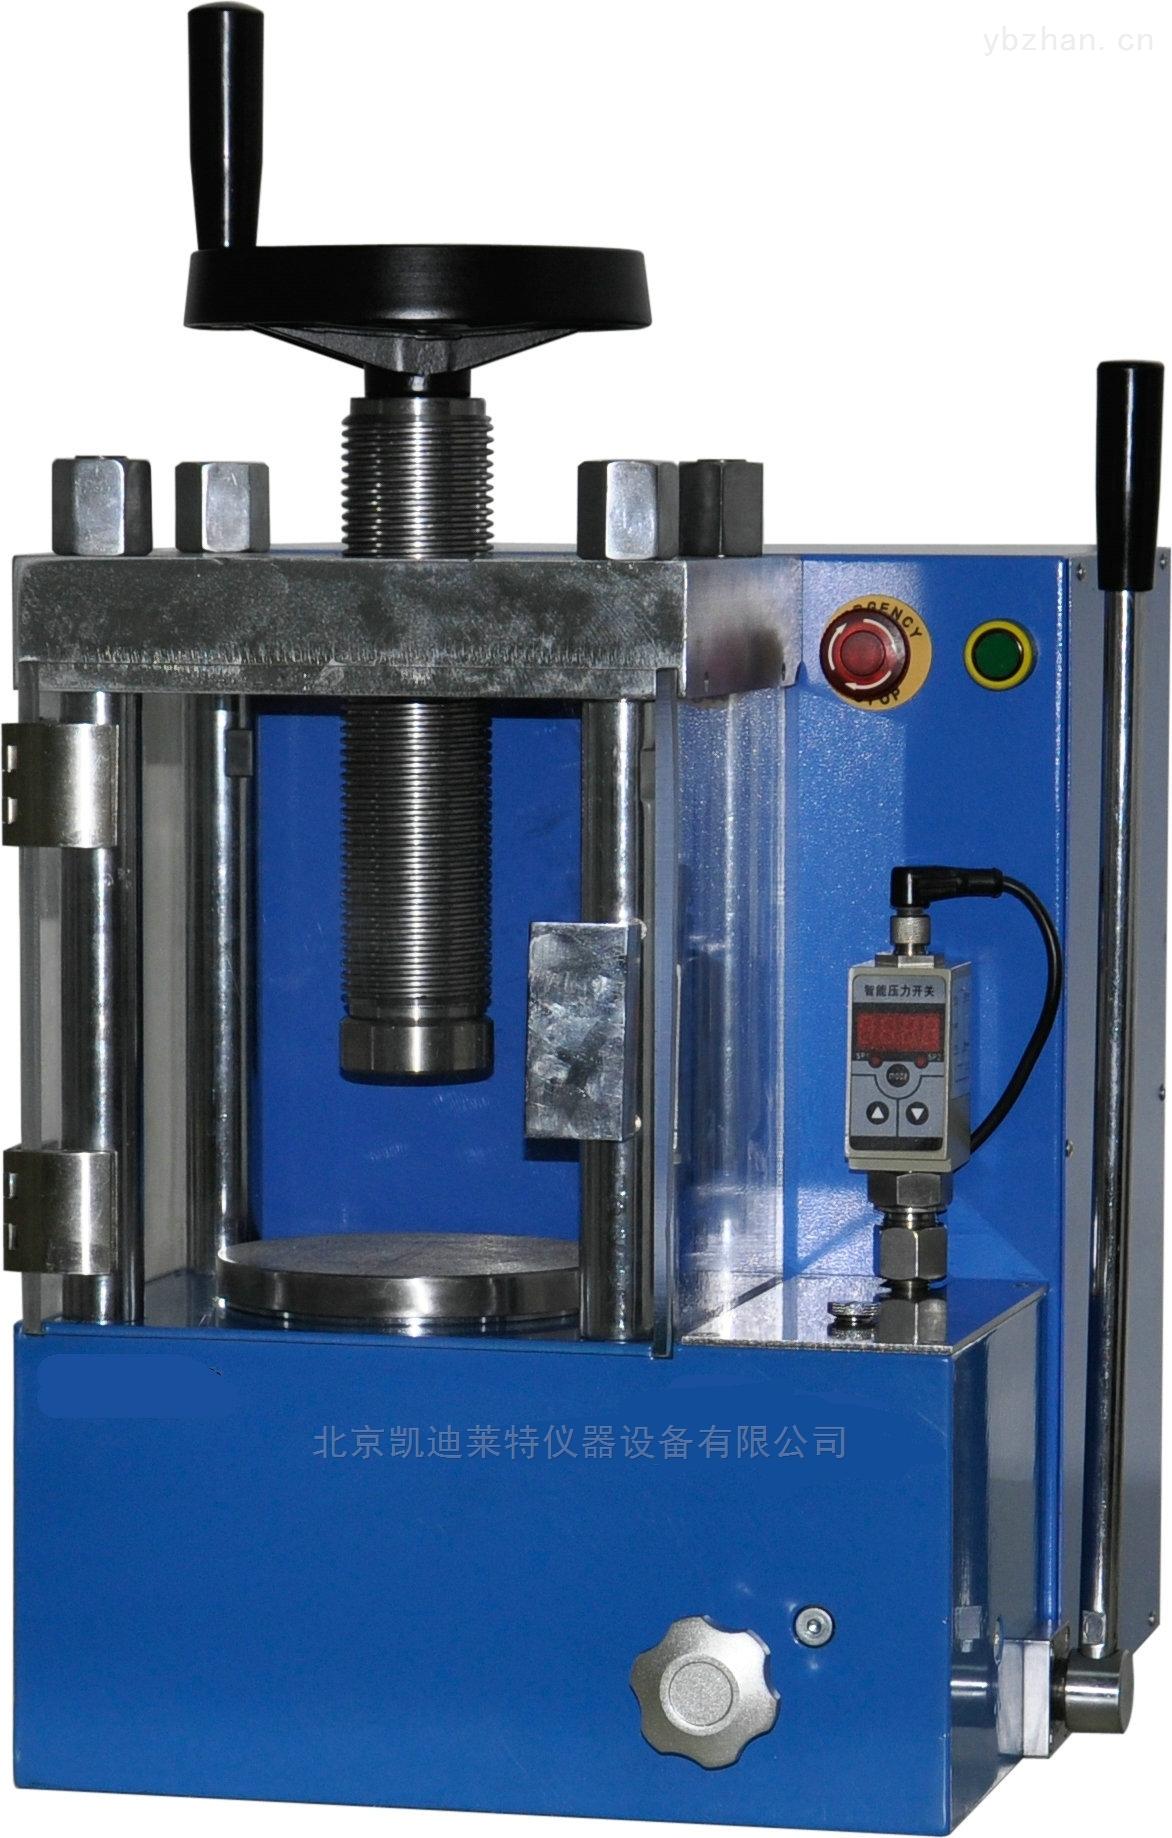 KDY-60D-天津凱興德茂電動粉末壓片機